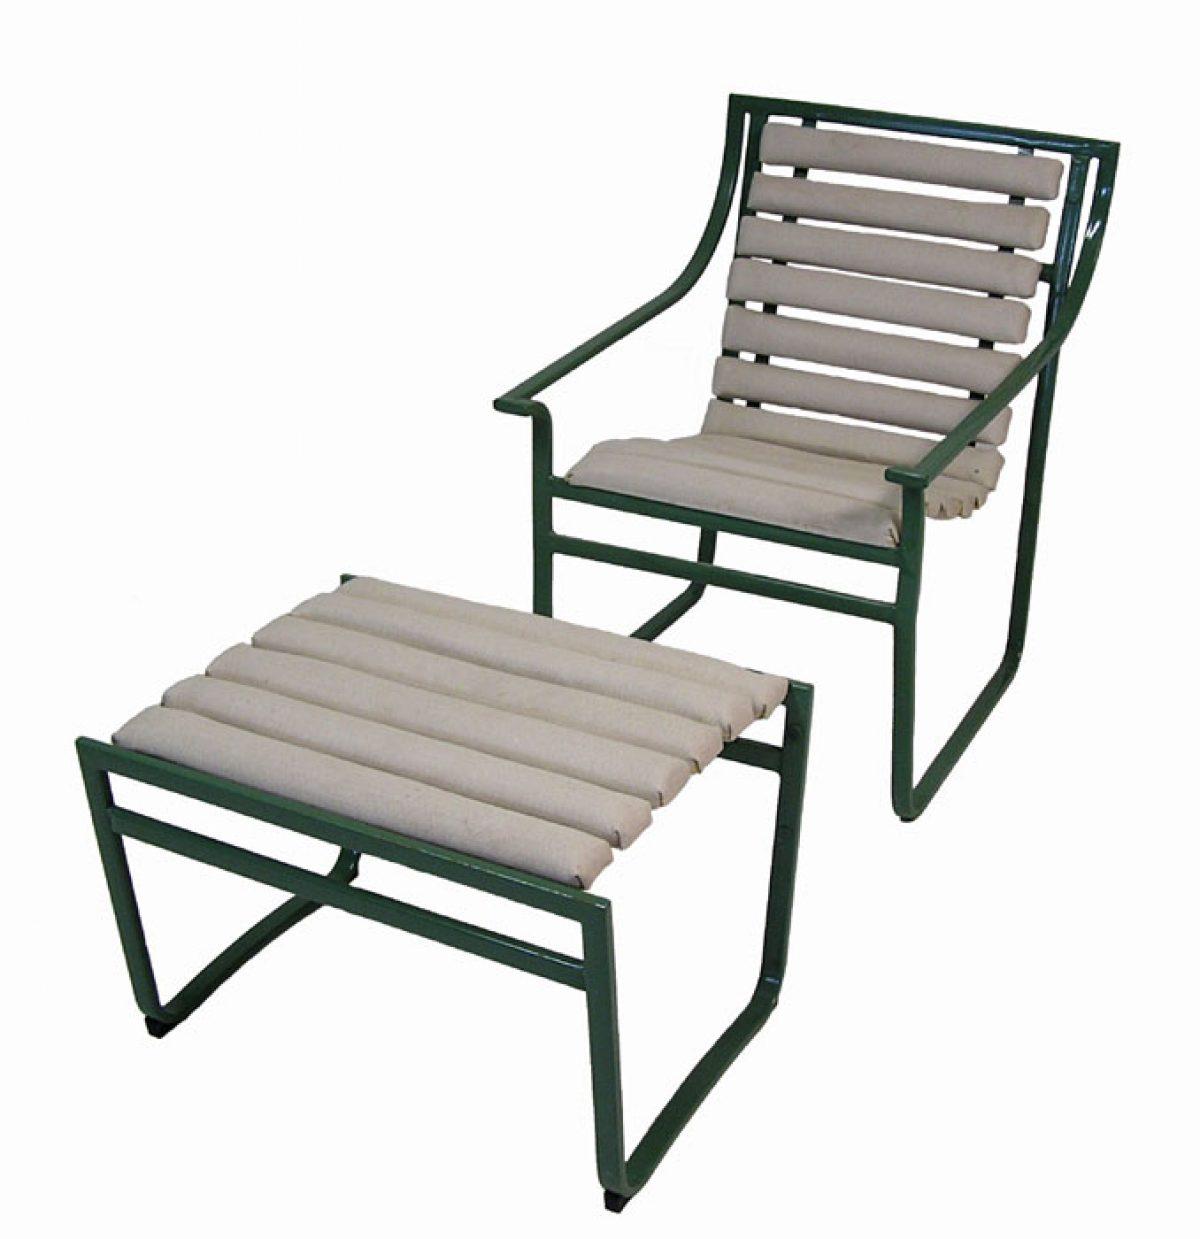 1970s Samsonite Tubular Steel Patio Chair U0026 Ottoman U2013 Hoopers Modern